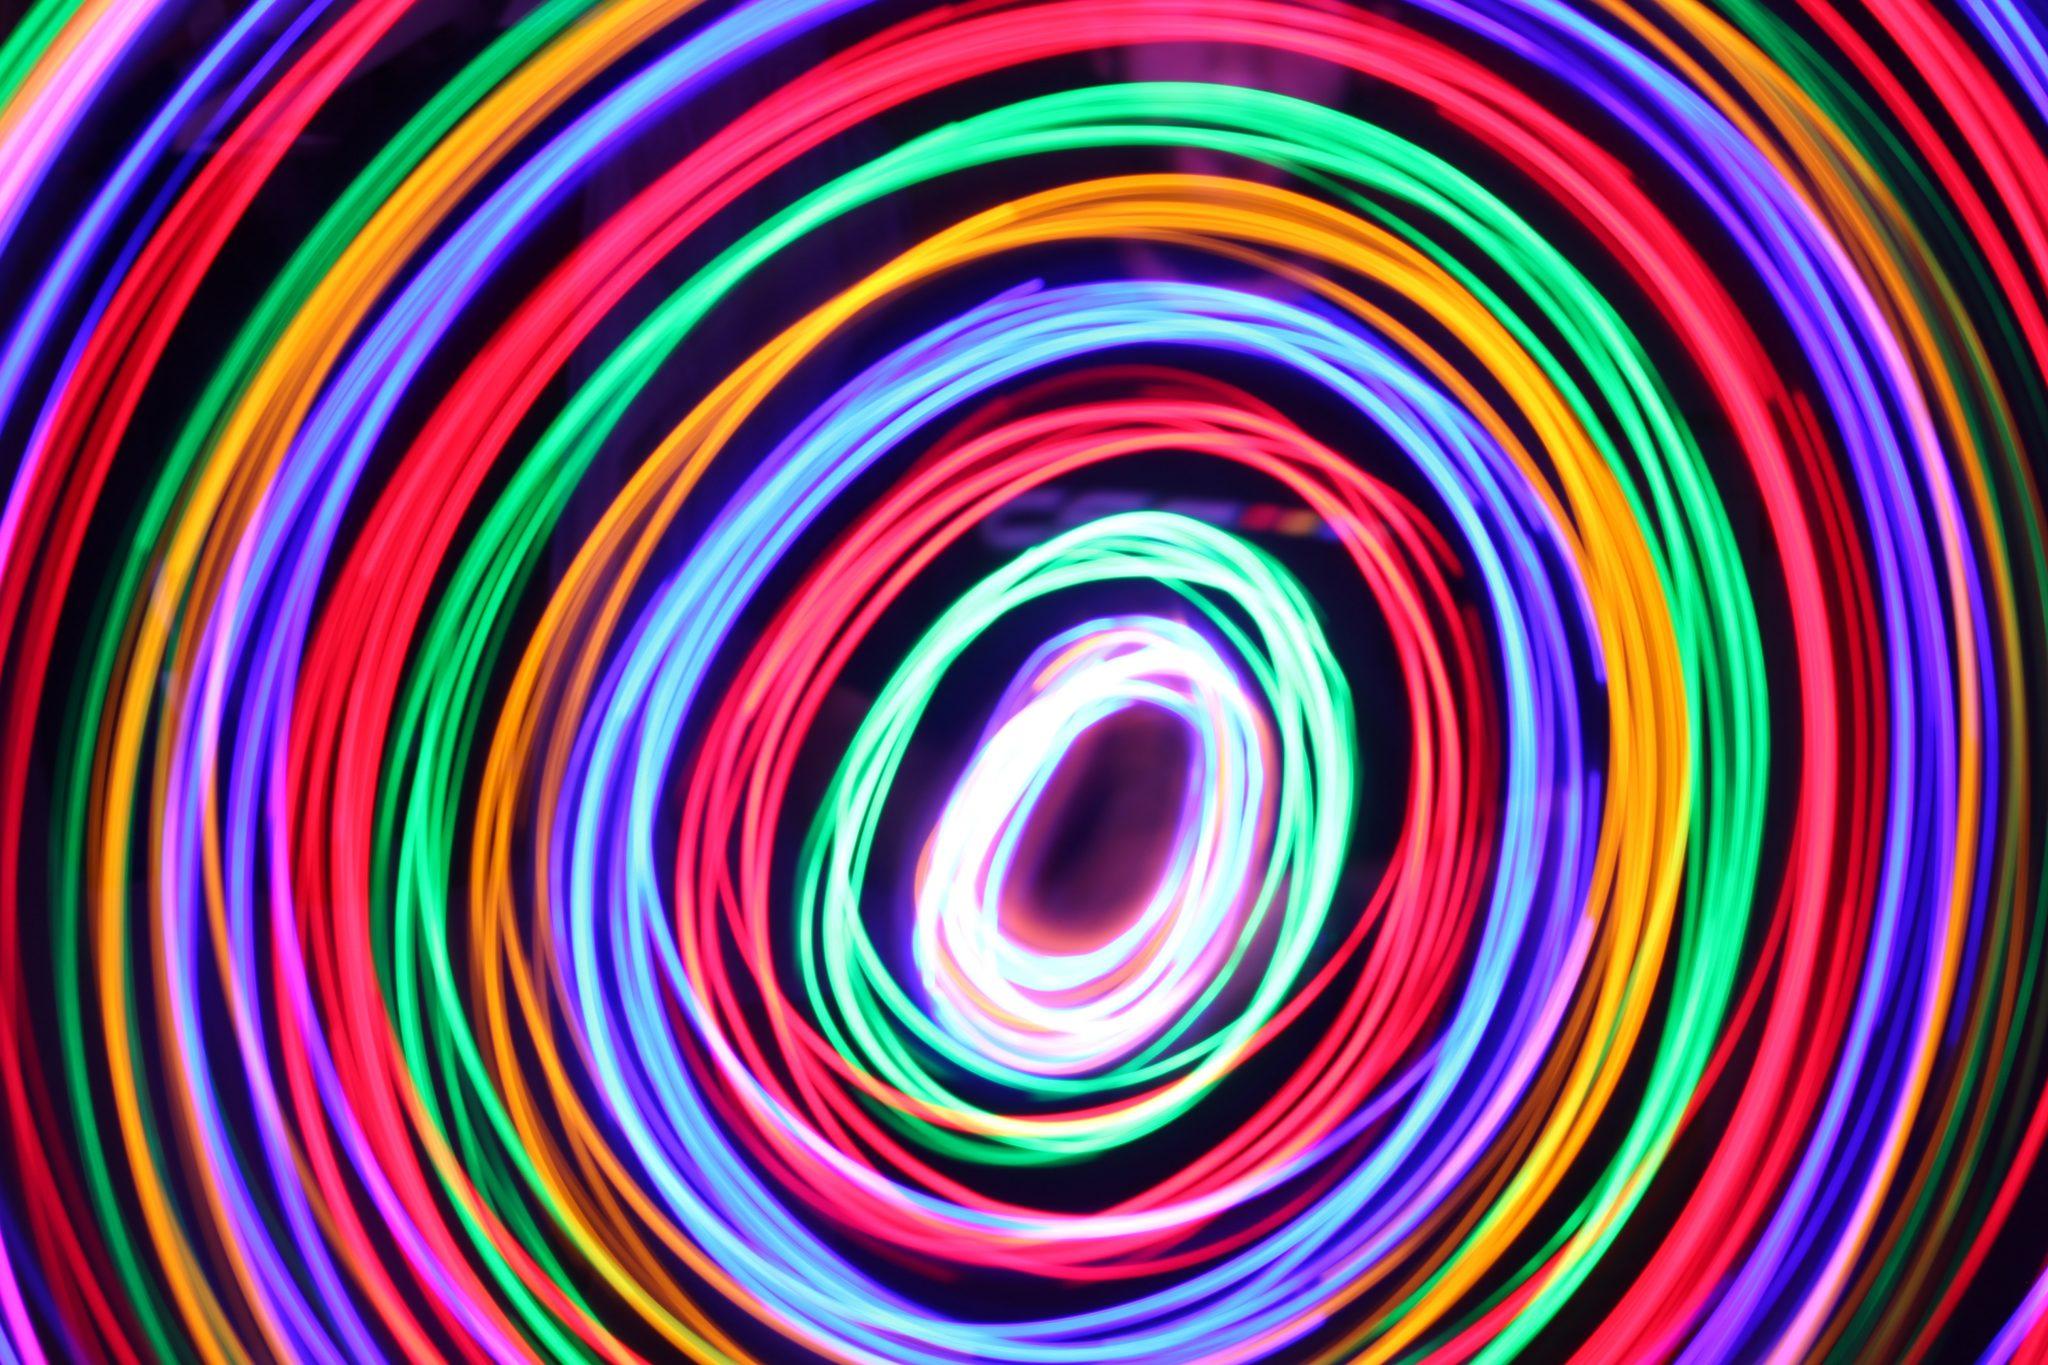 Circular coloured lights photo by paola galimberti on usplash